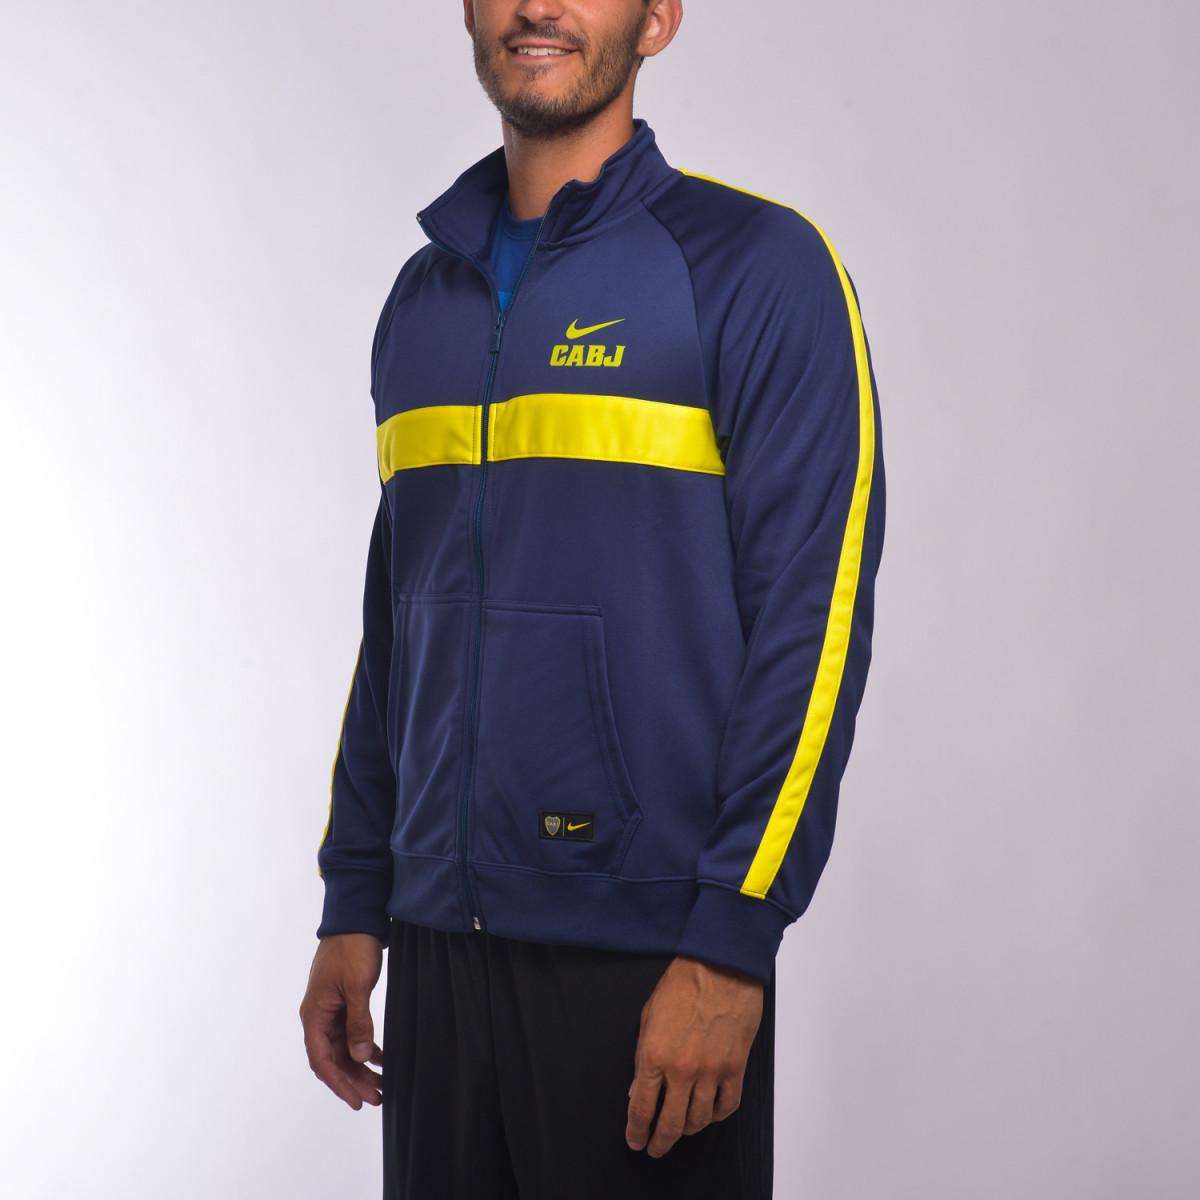 Campera Nike Boca Juniors - Indumentaria Fútbol - Hombre 6a041ddcd7540